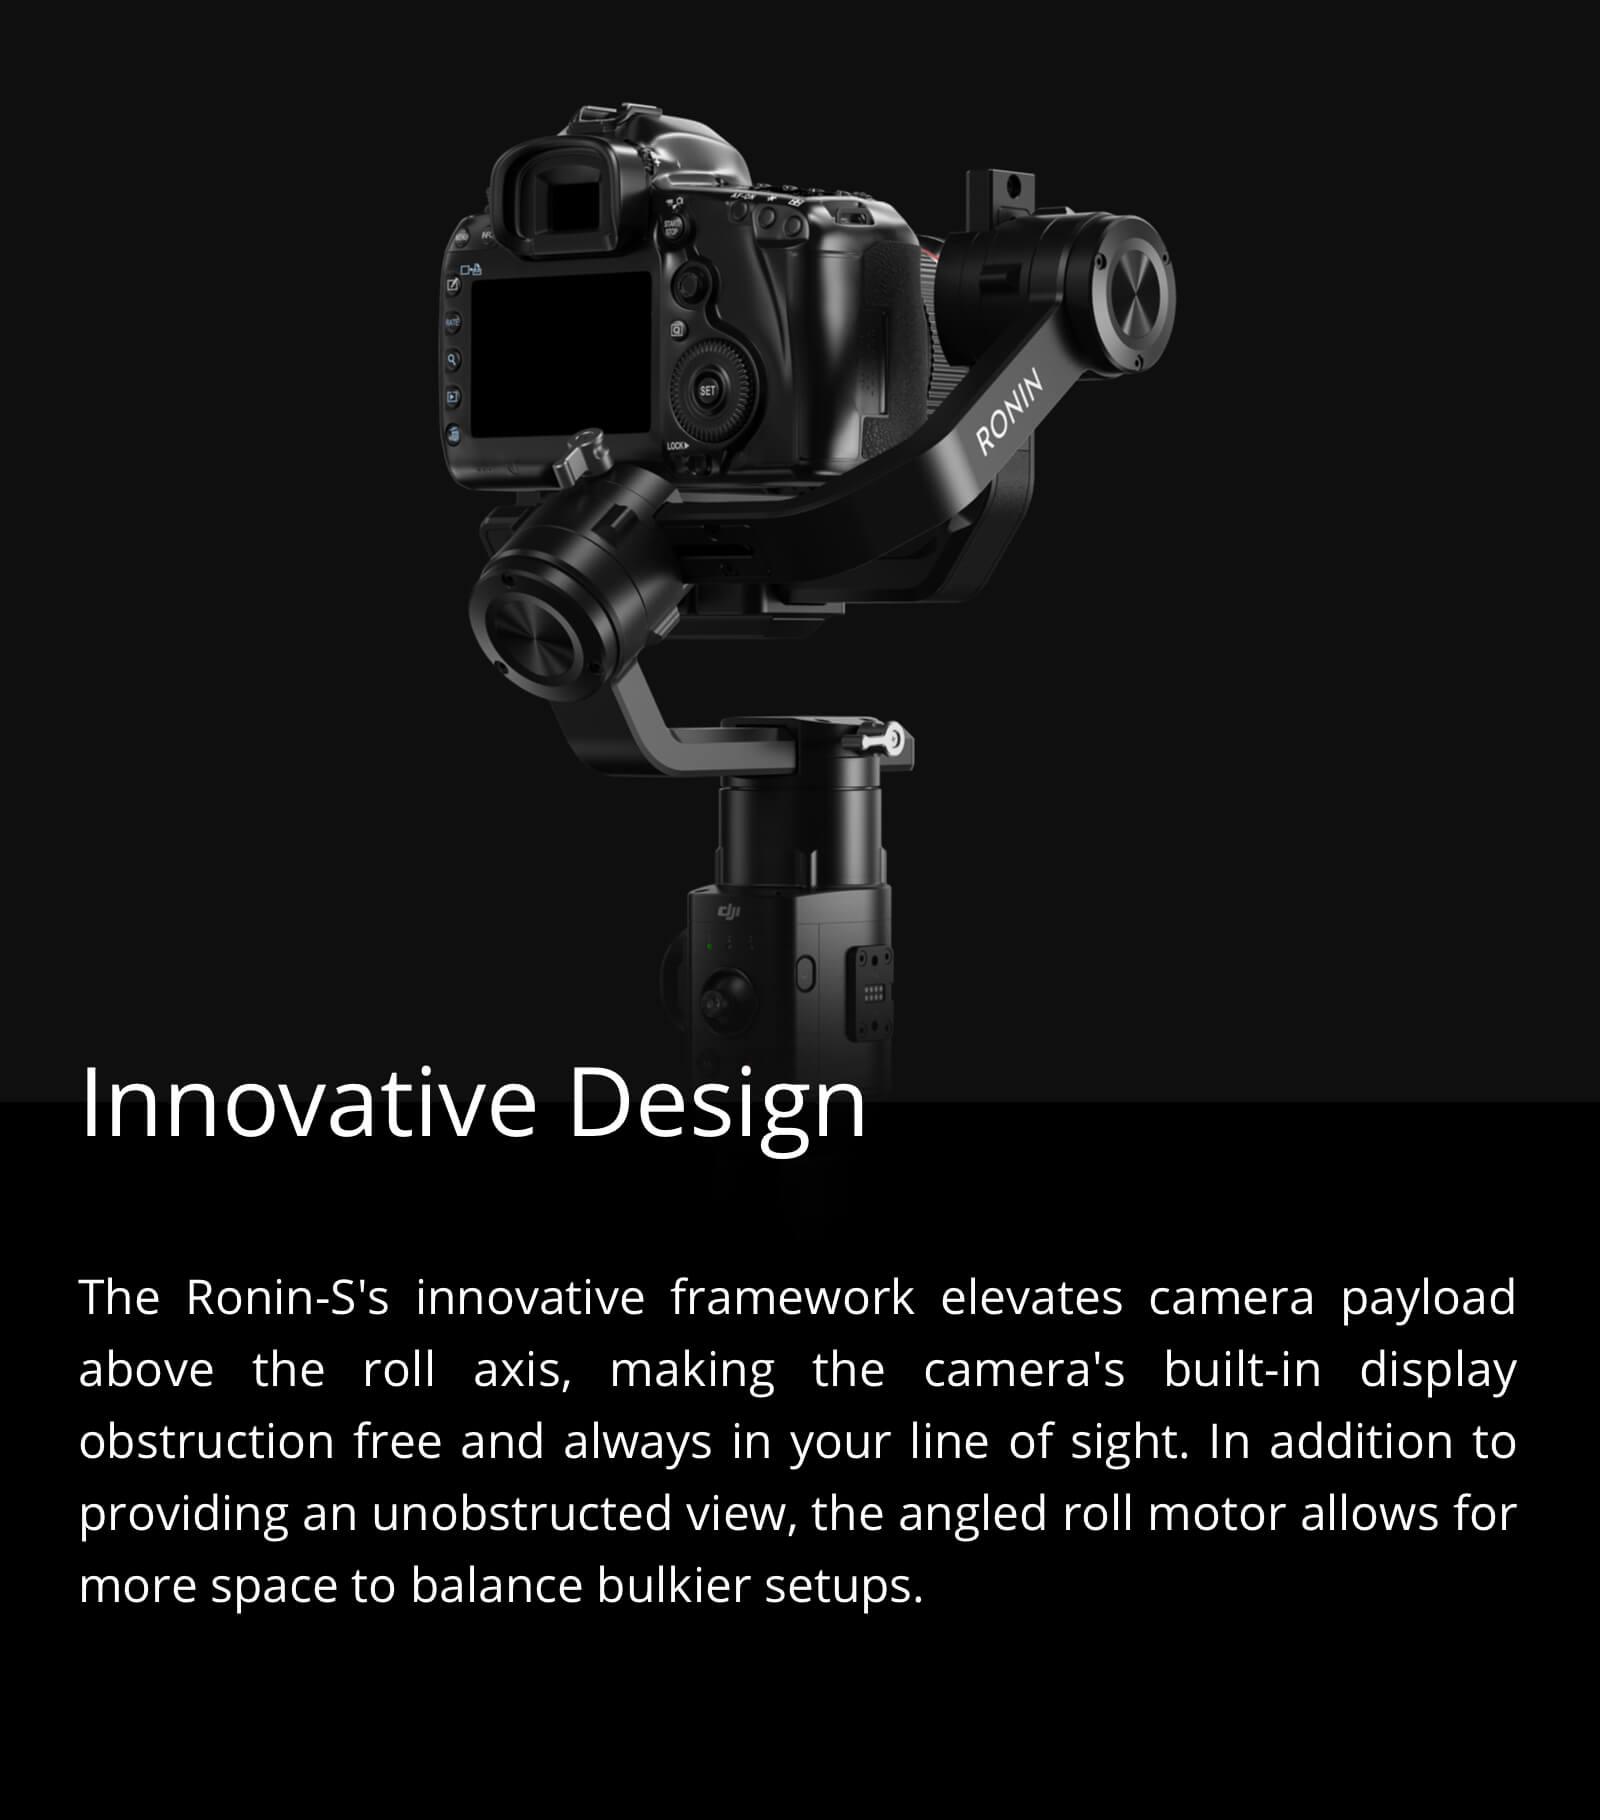 Ronin-S Design